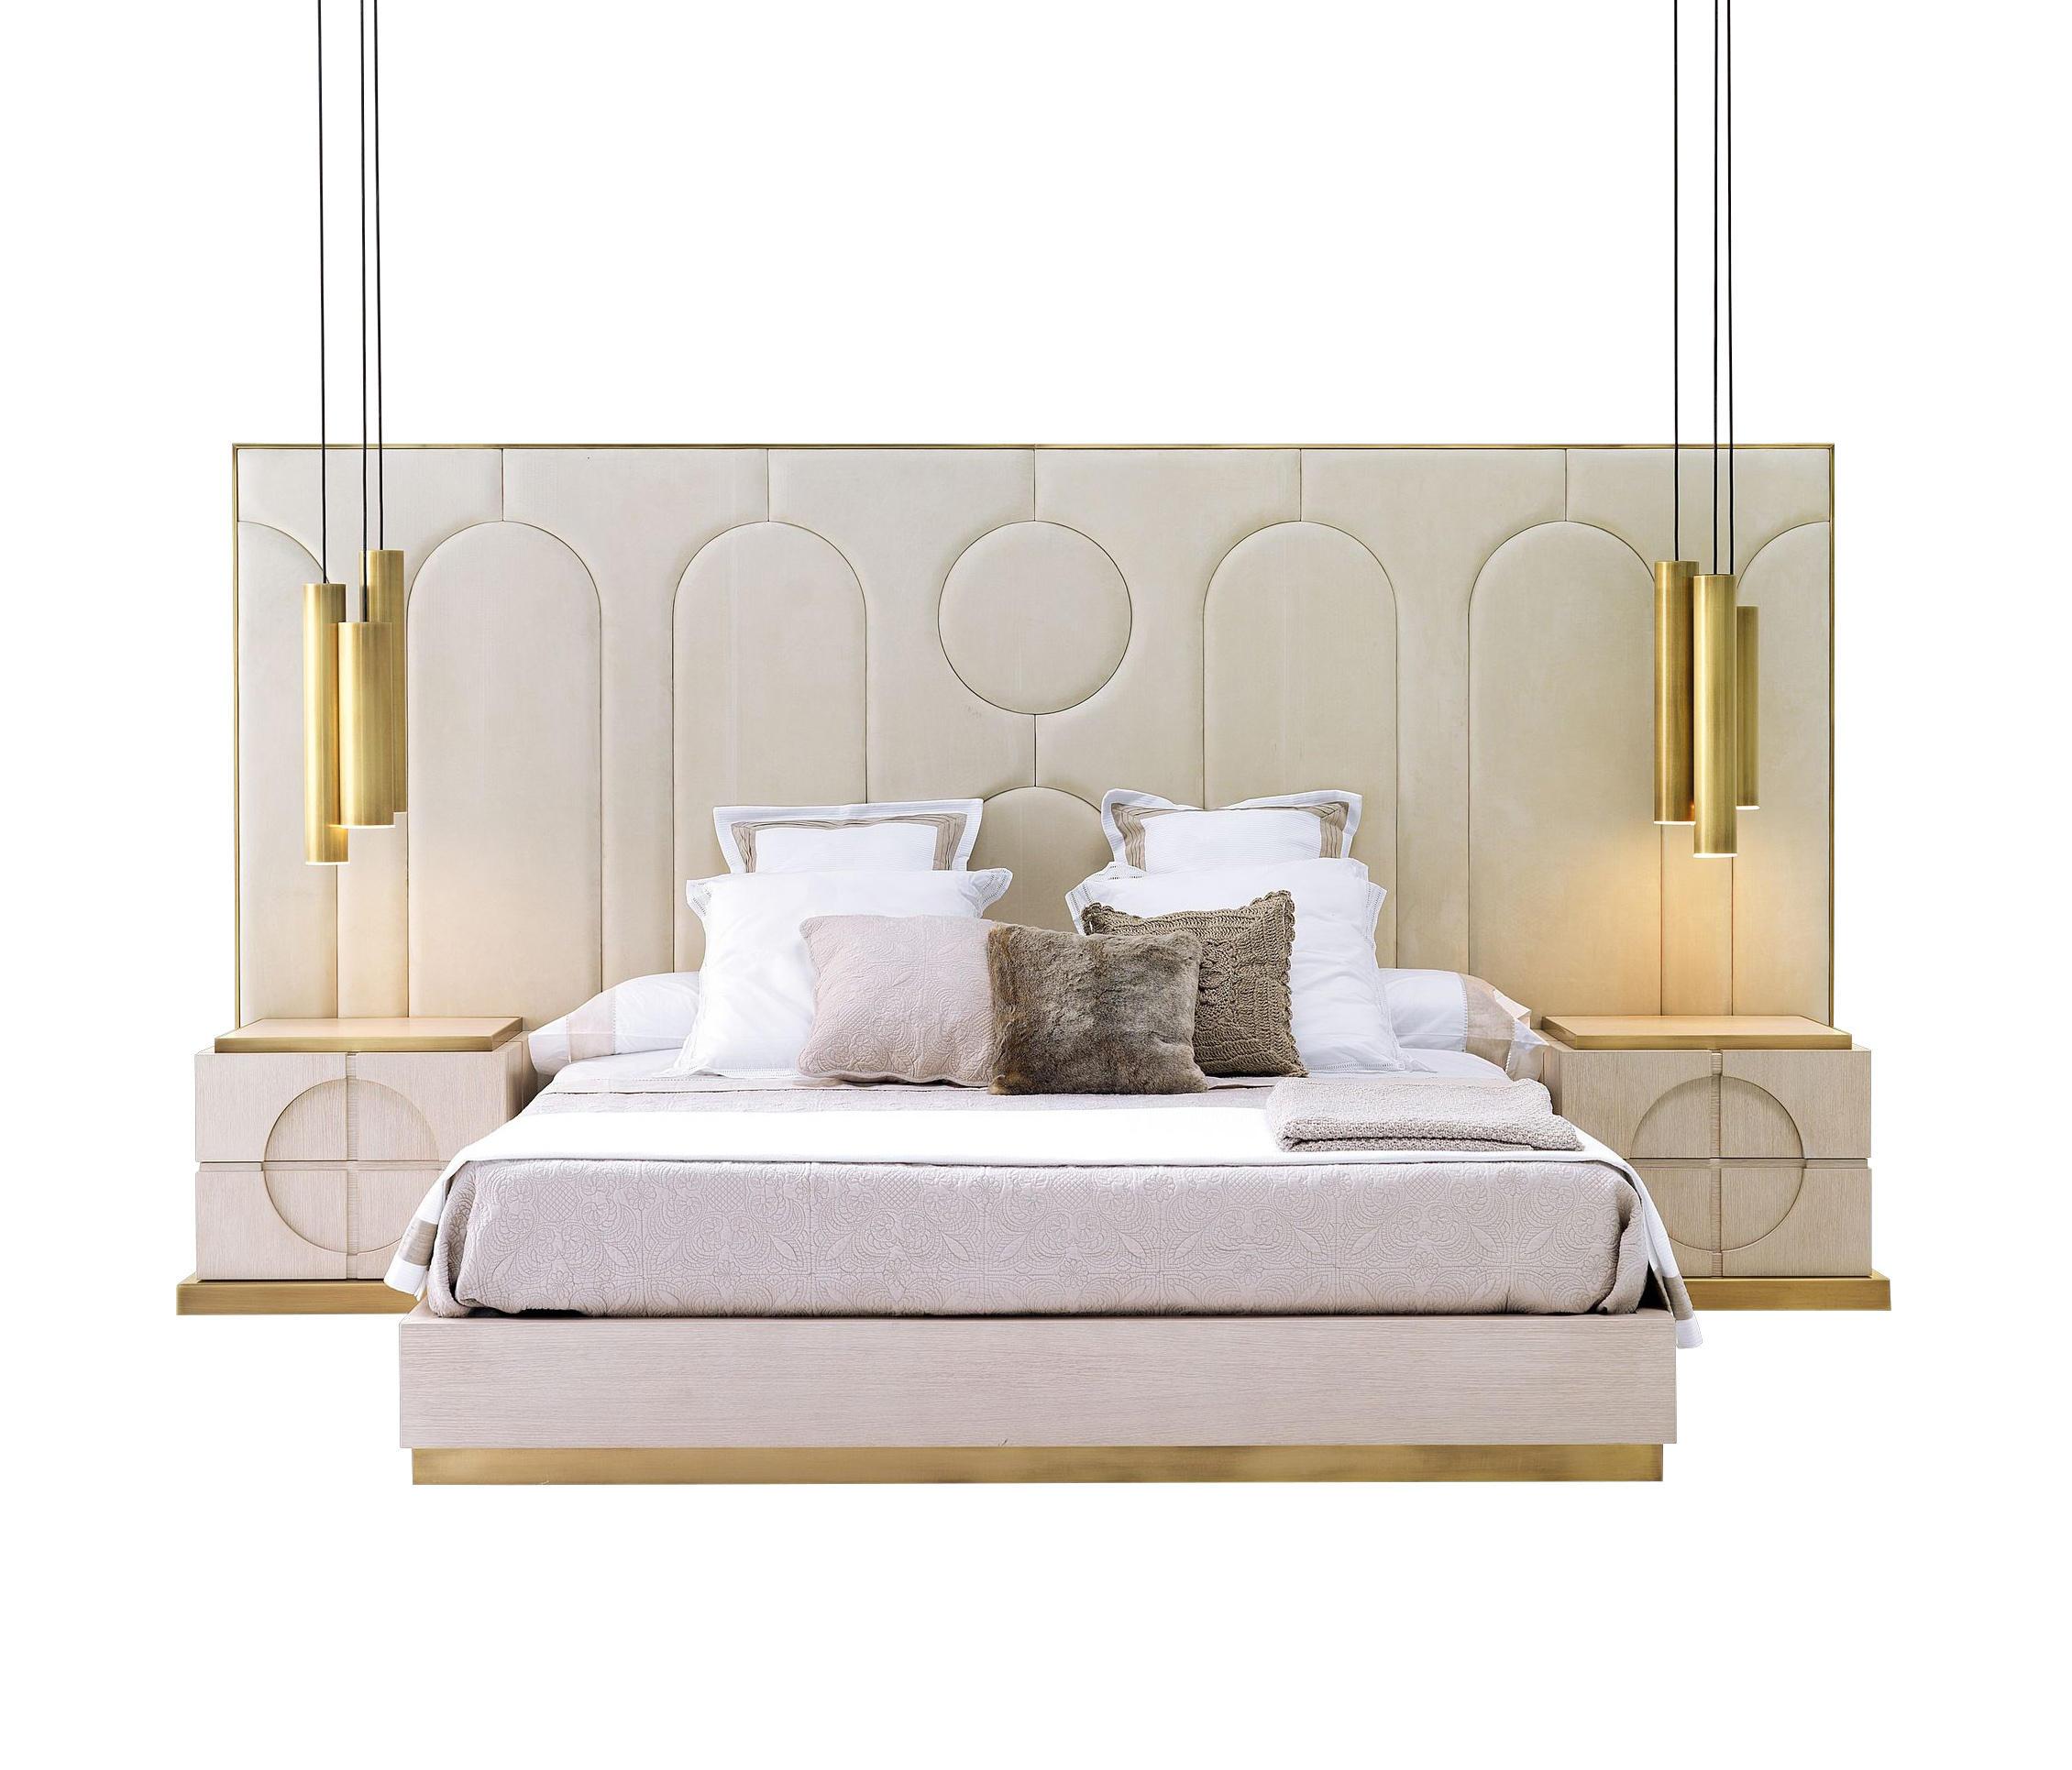 Parma Bed Set By MOBILFRESNO ALTERNATIVE | Double Beds ...